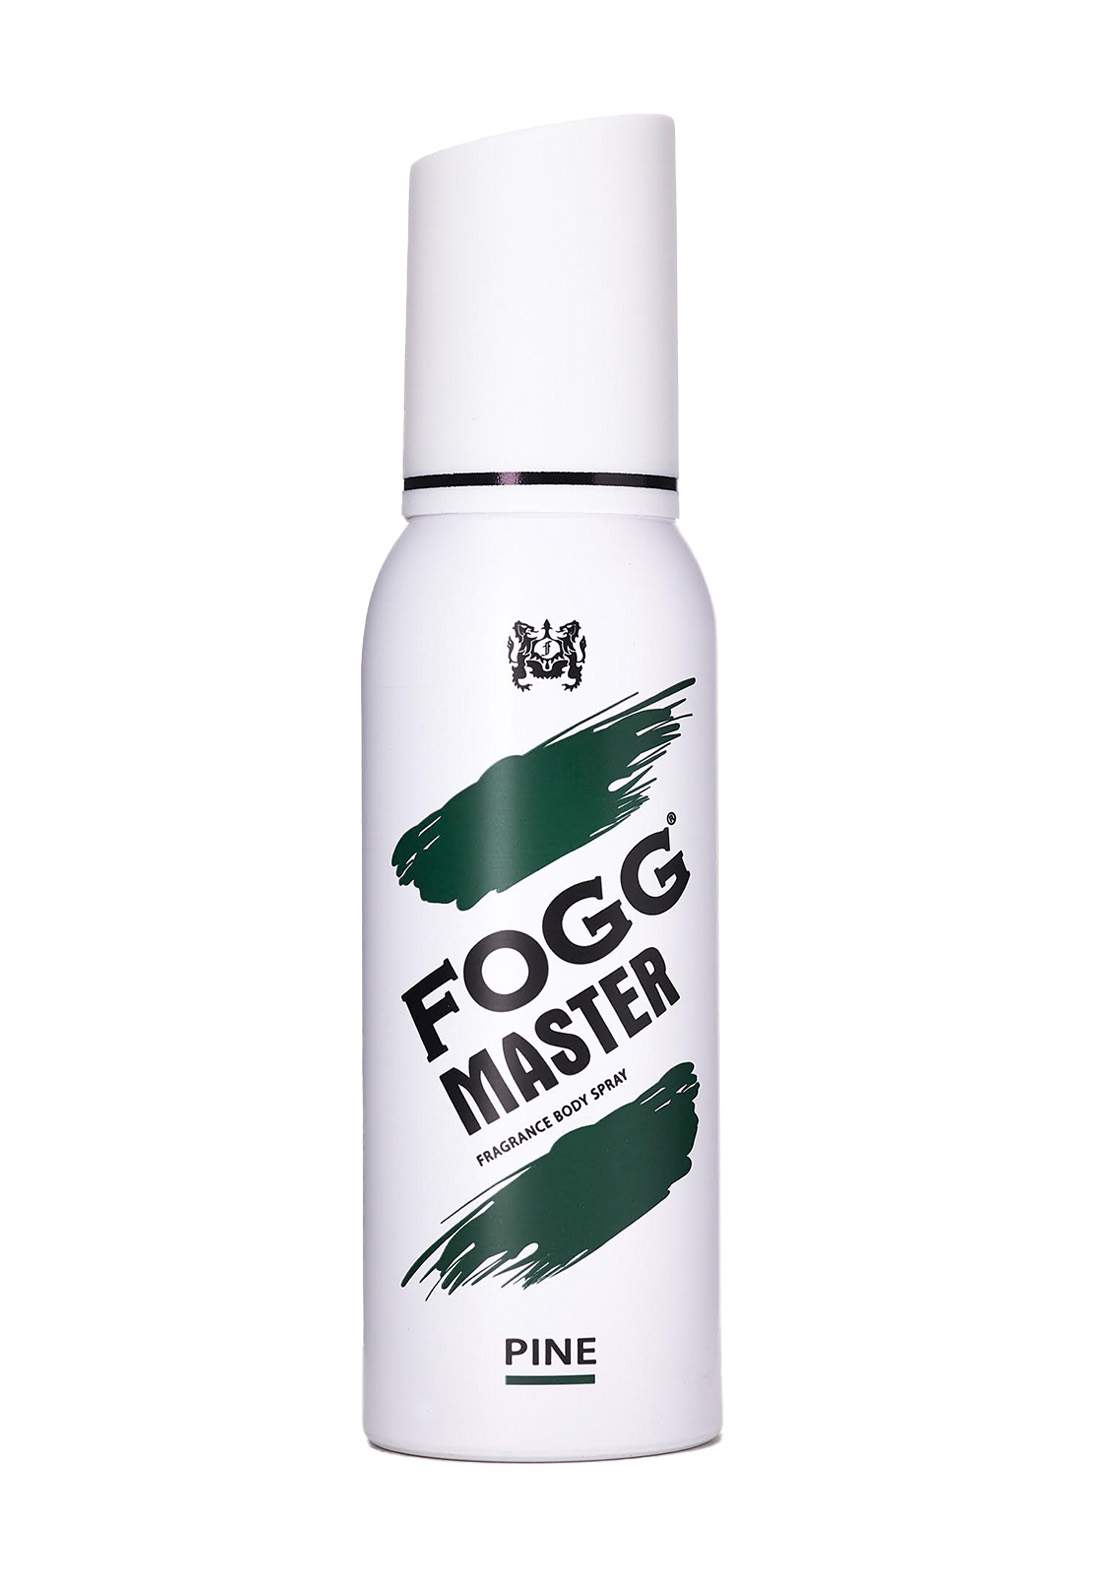 Fogg Master Pine Fragrance Body Spray 120ml معطر جسم رجالي